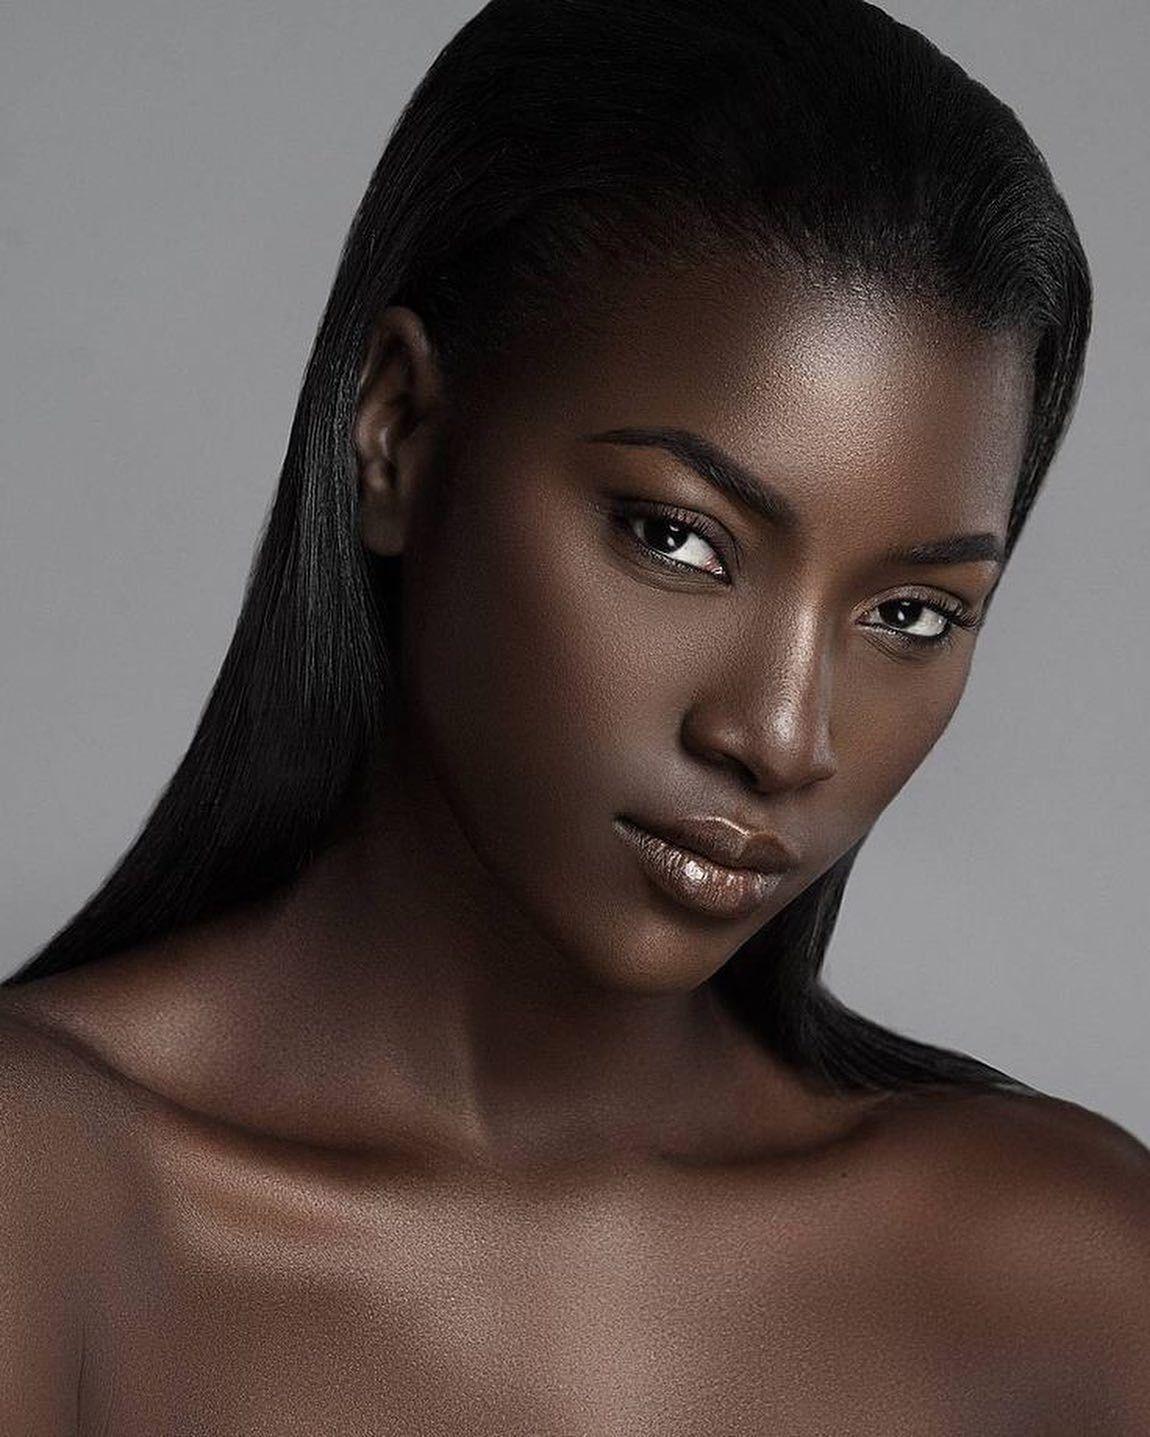 Pin by Angel Doyle on Black Gold Beautiful dark skin